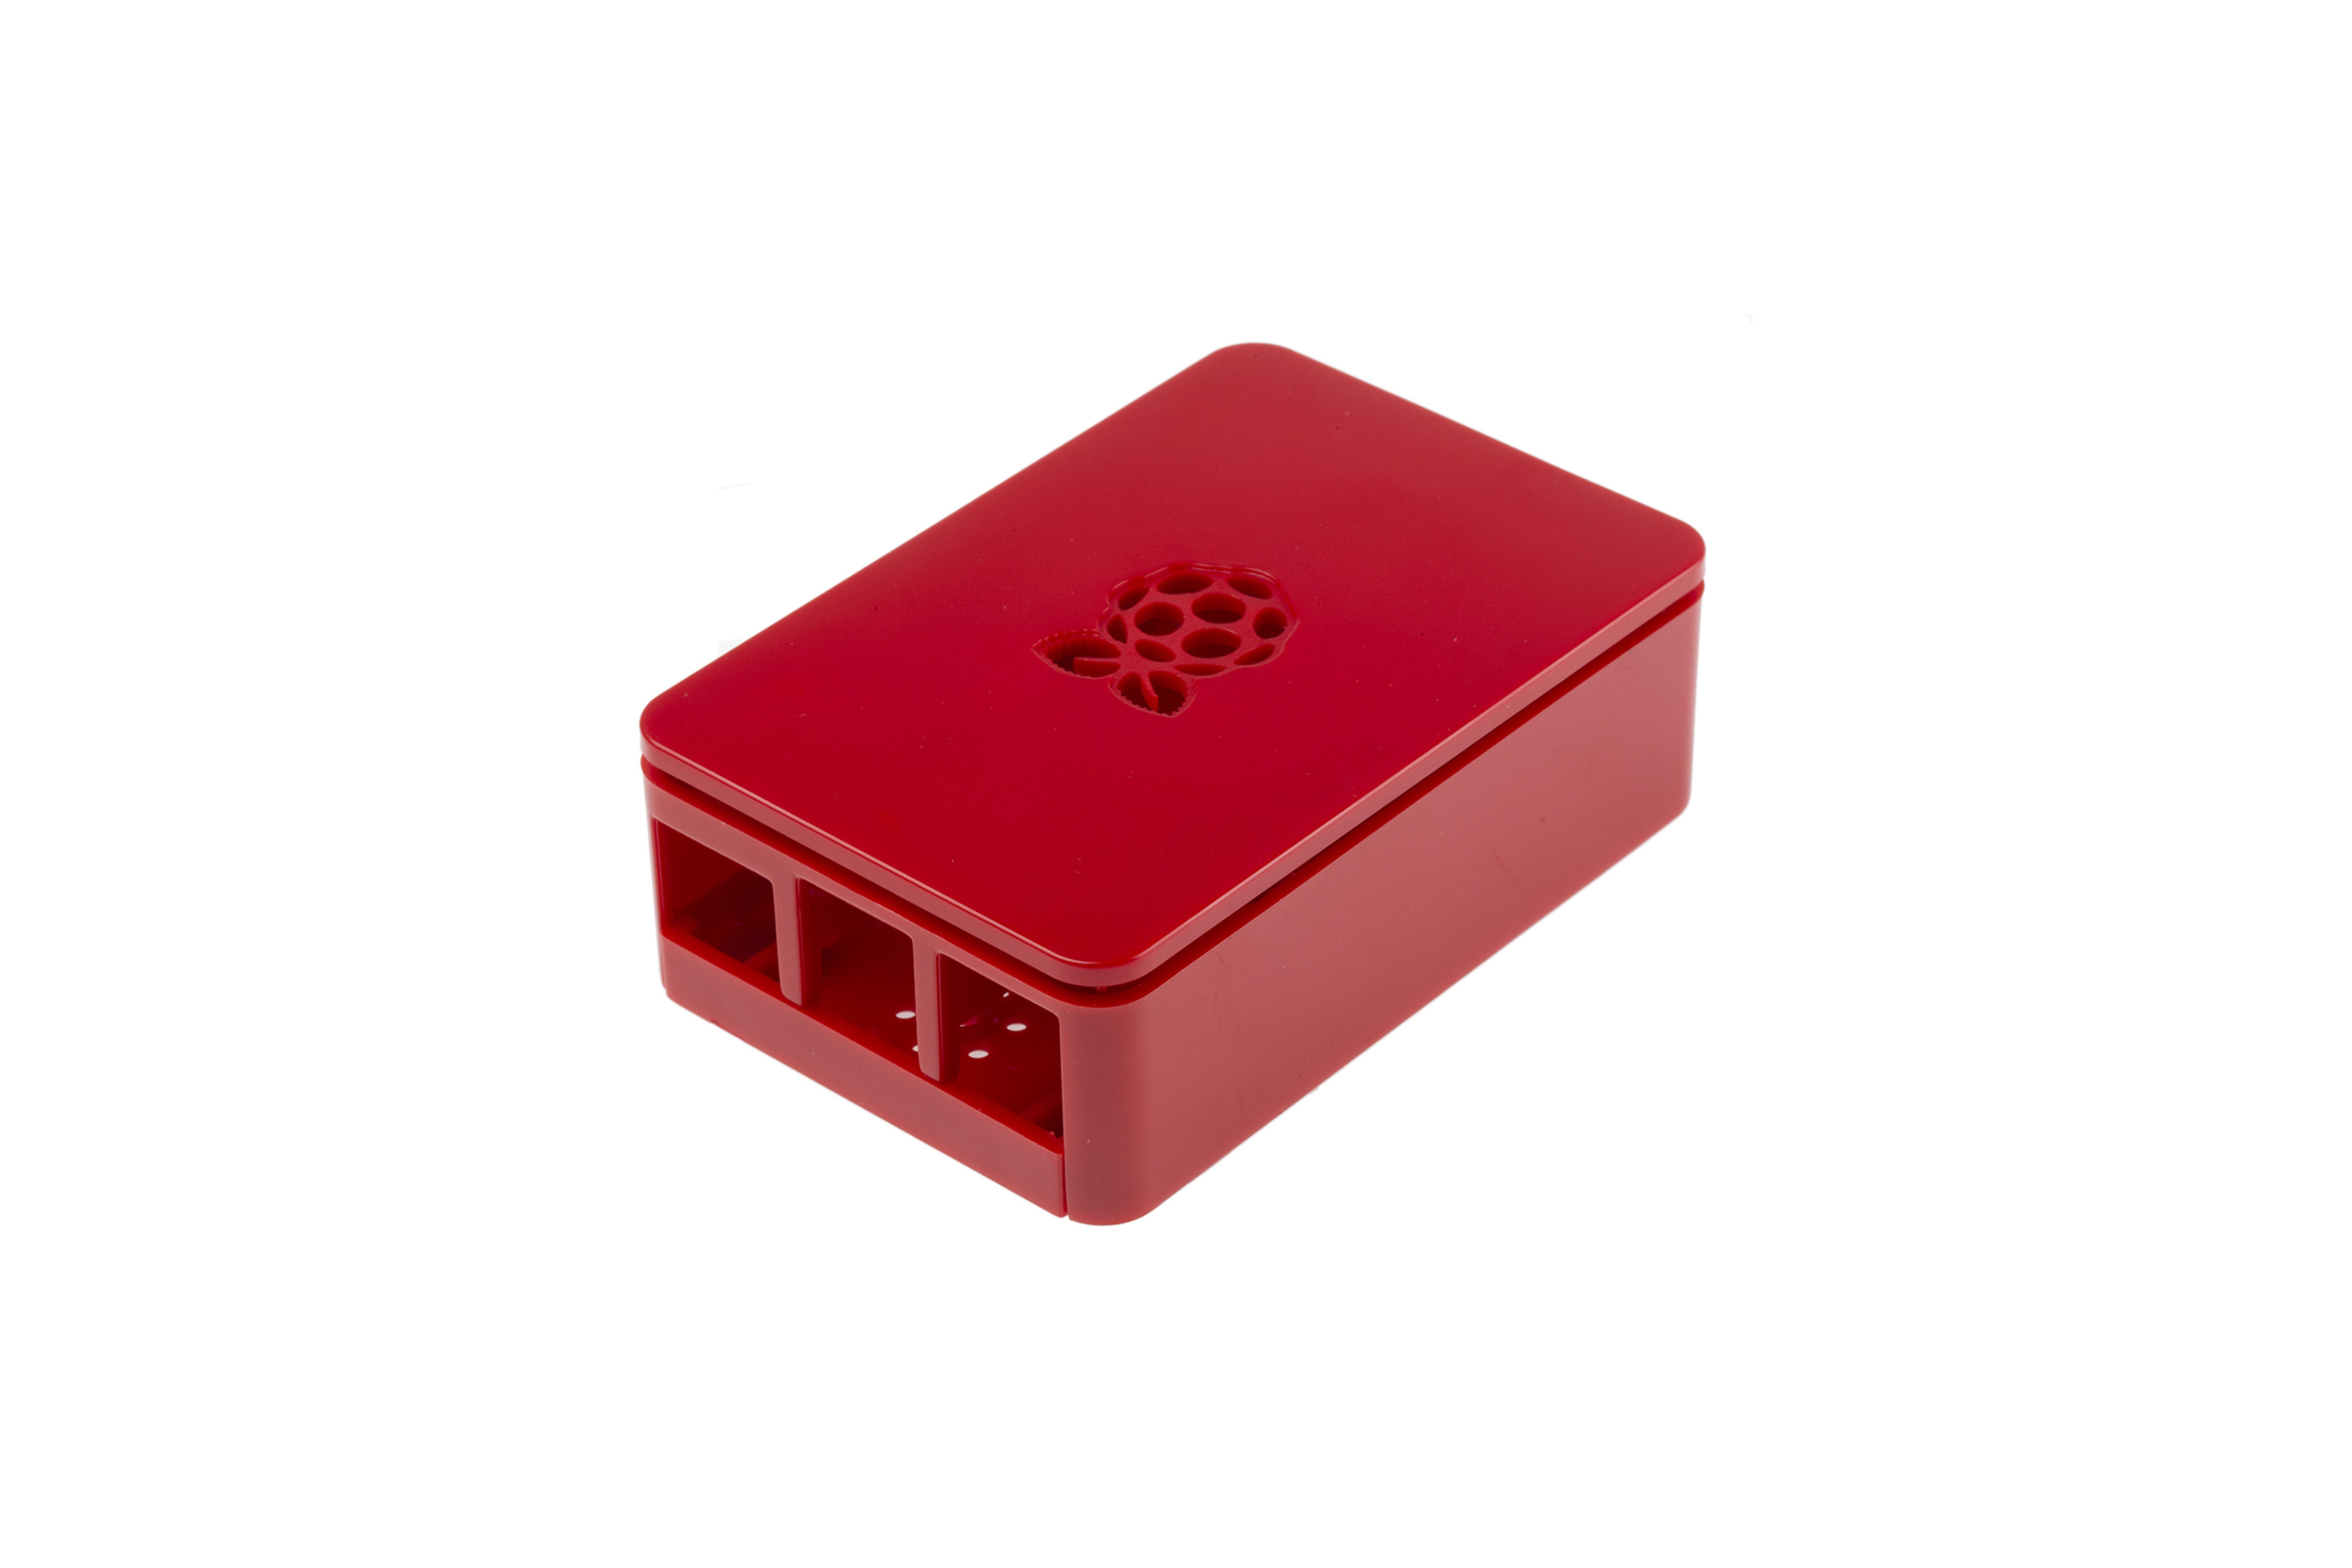 Raspberry Pi 3 Case esterno, Rosso